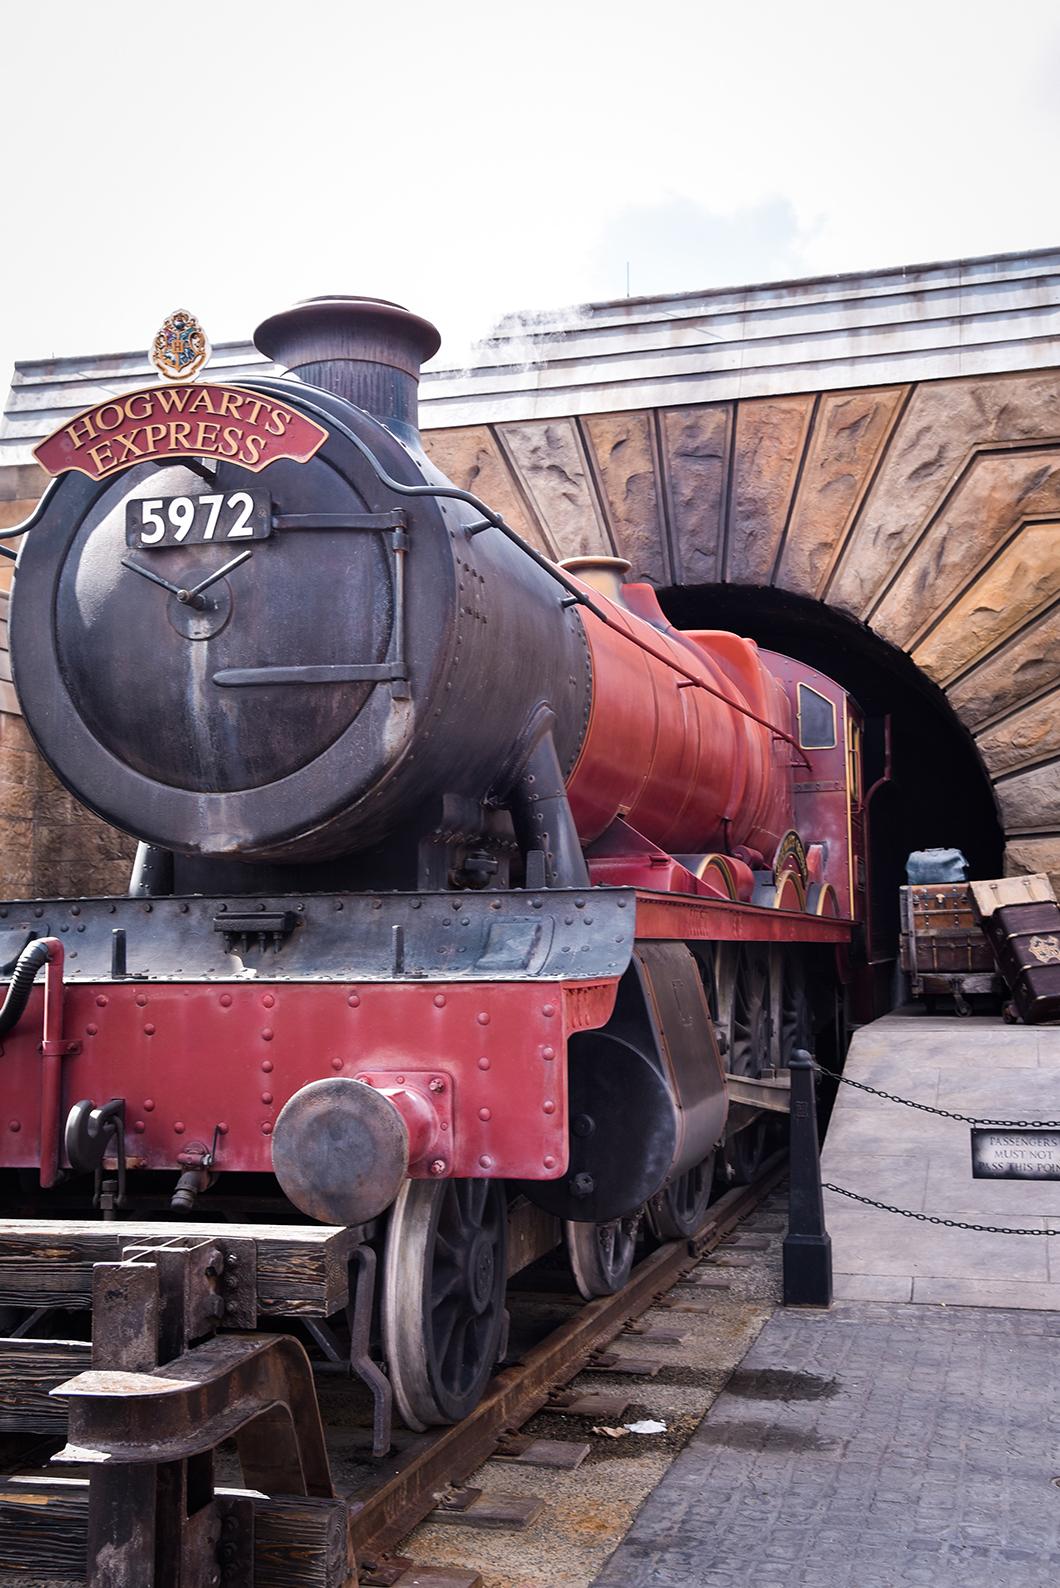 Le poudlard express, Universal Studios Orlando